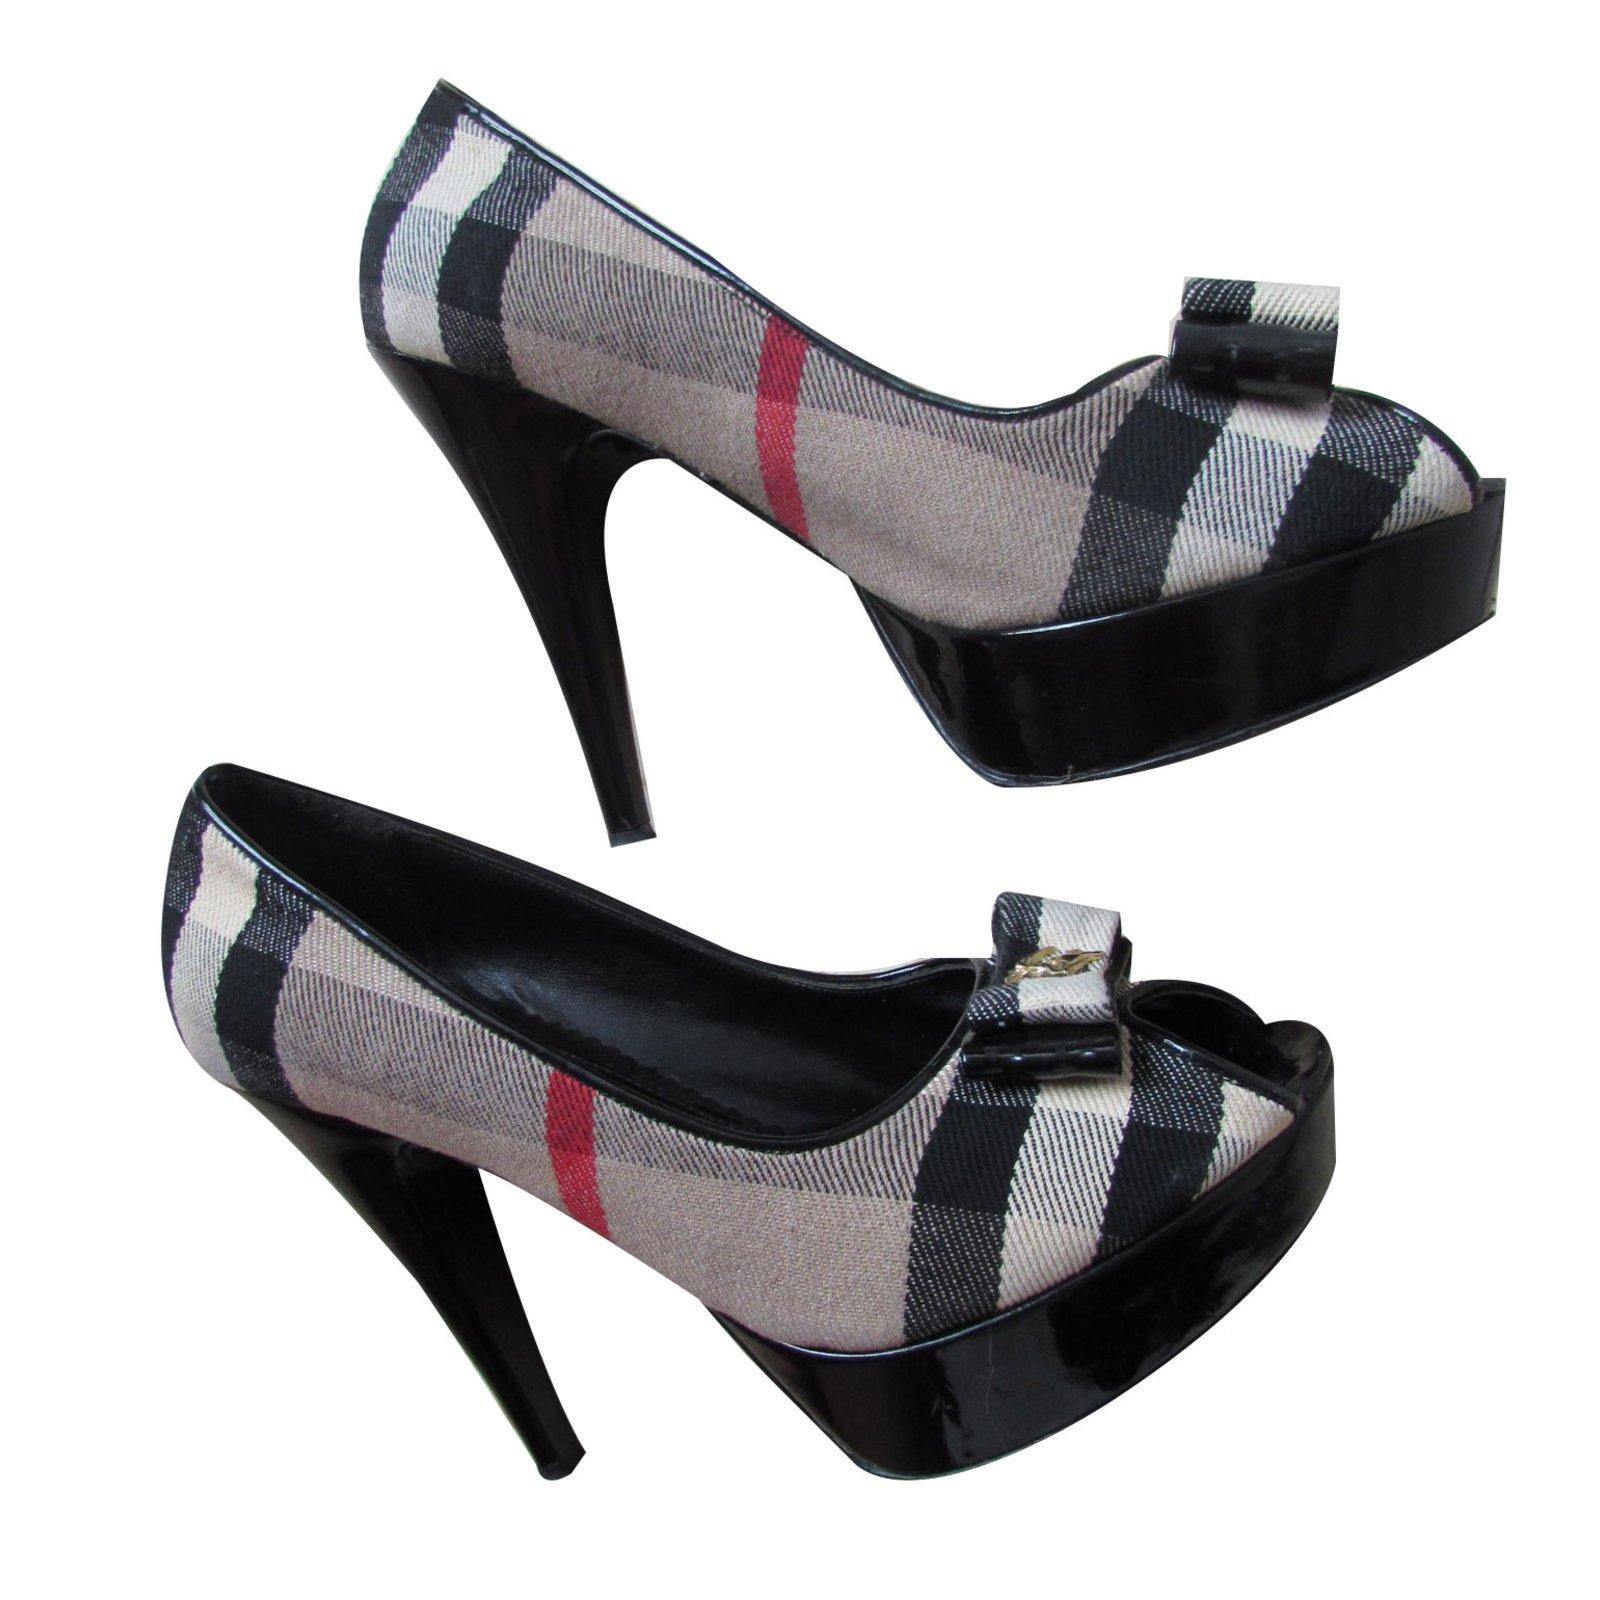 c8fd76794fa Burberry Heels Heels Patent leather